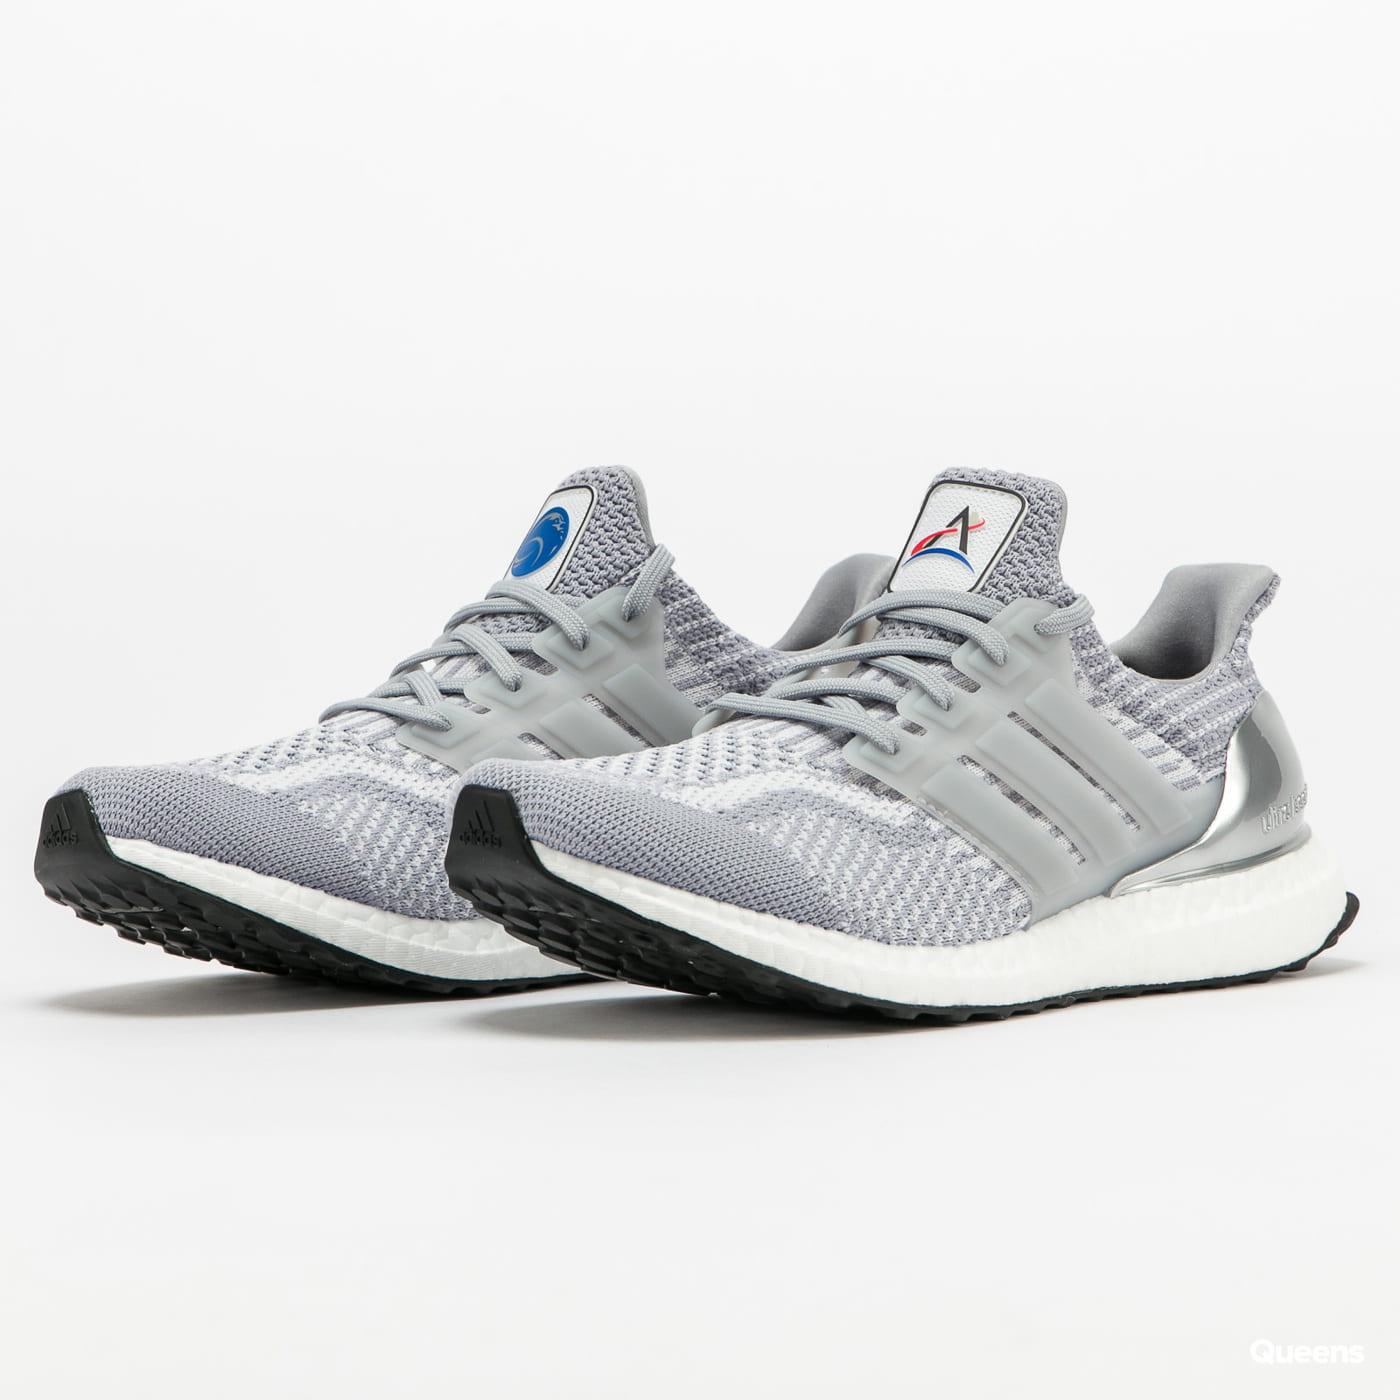 adidas Performance Ultraboost 5.0 DNA halo silver / halo silver / dash grey